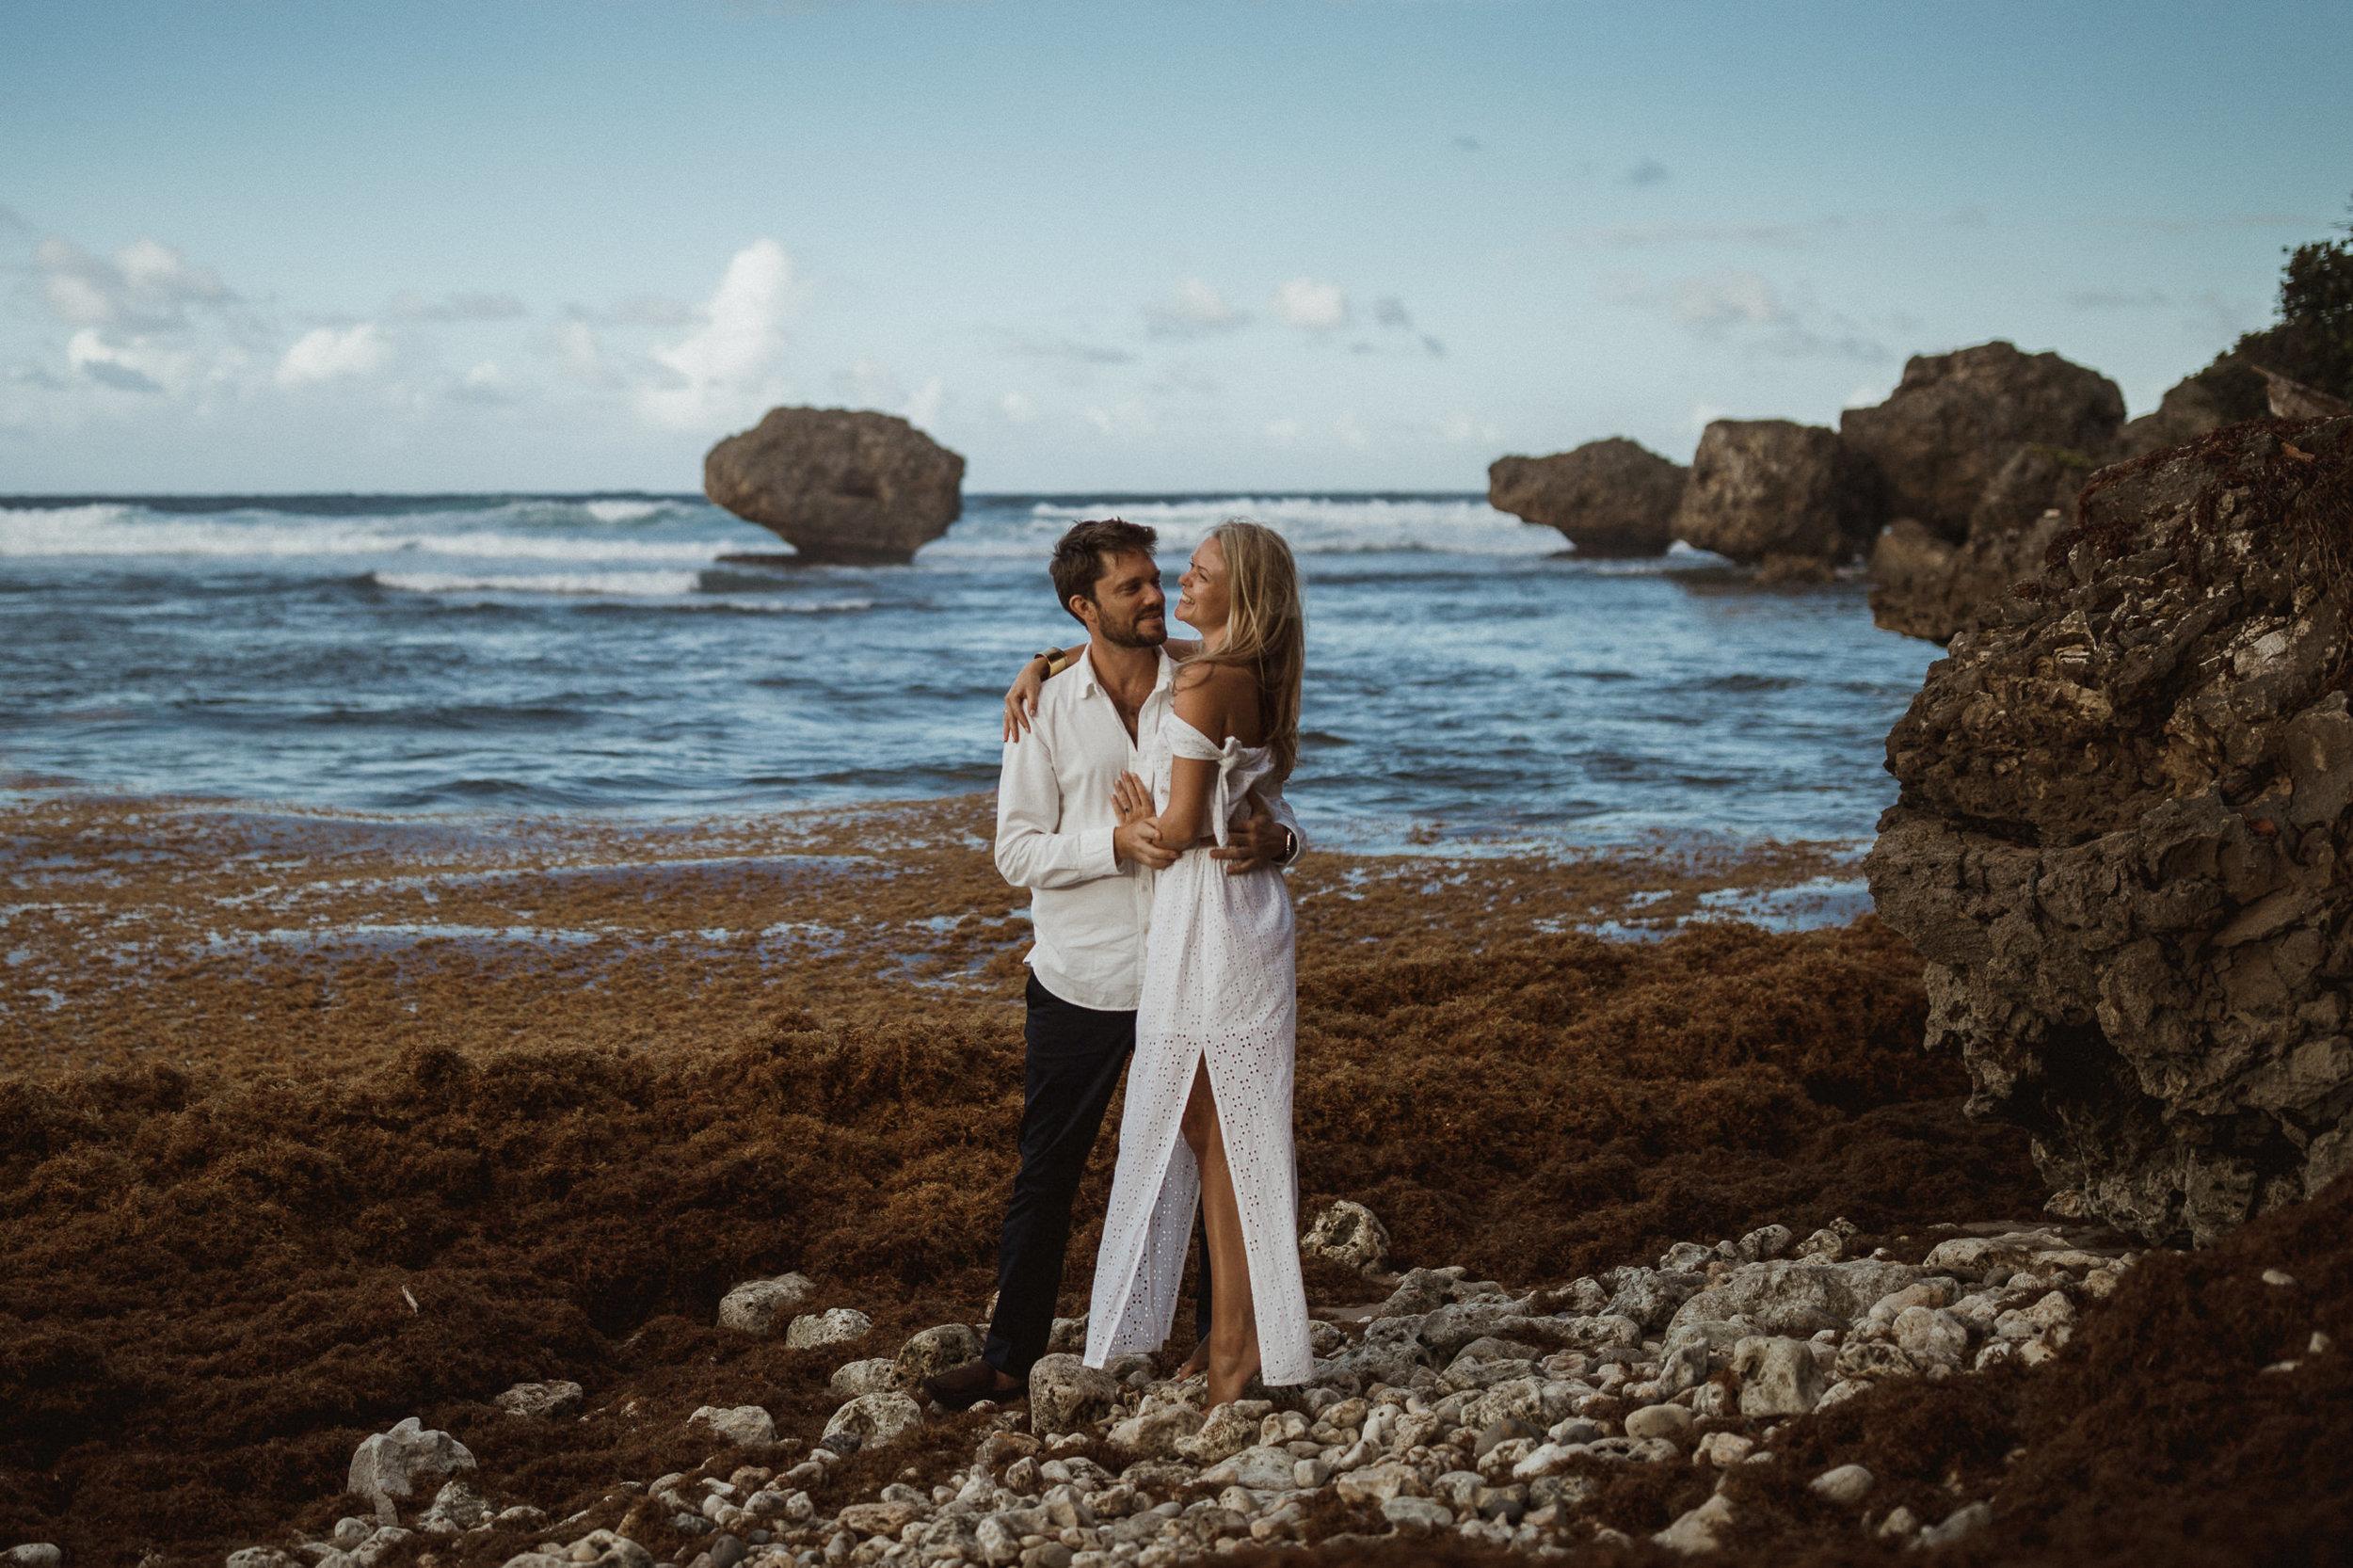 barbados_wedding_portrait_photographer_54.jpg